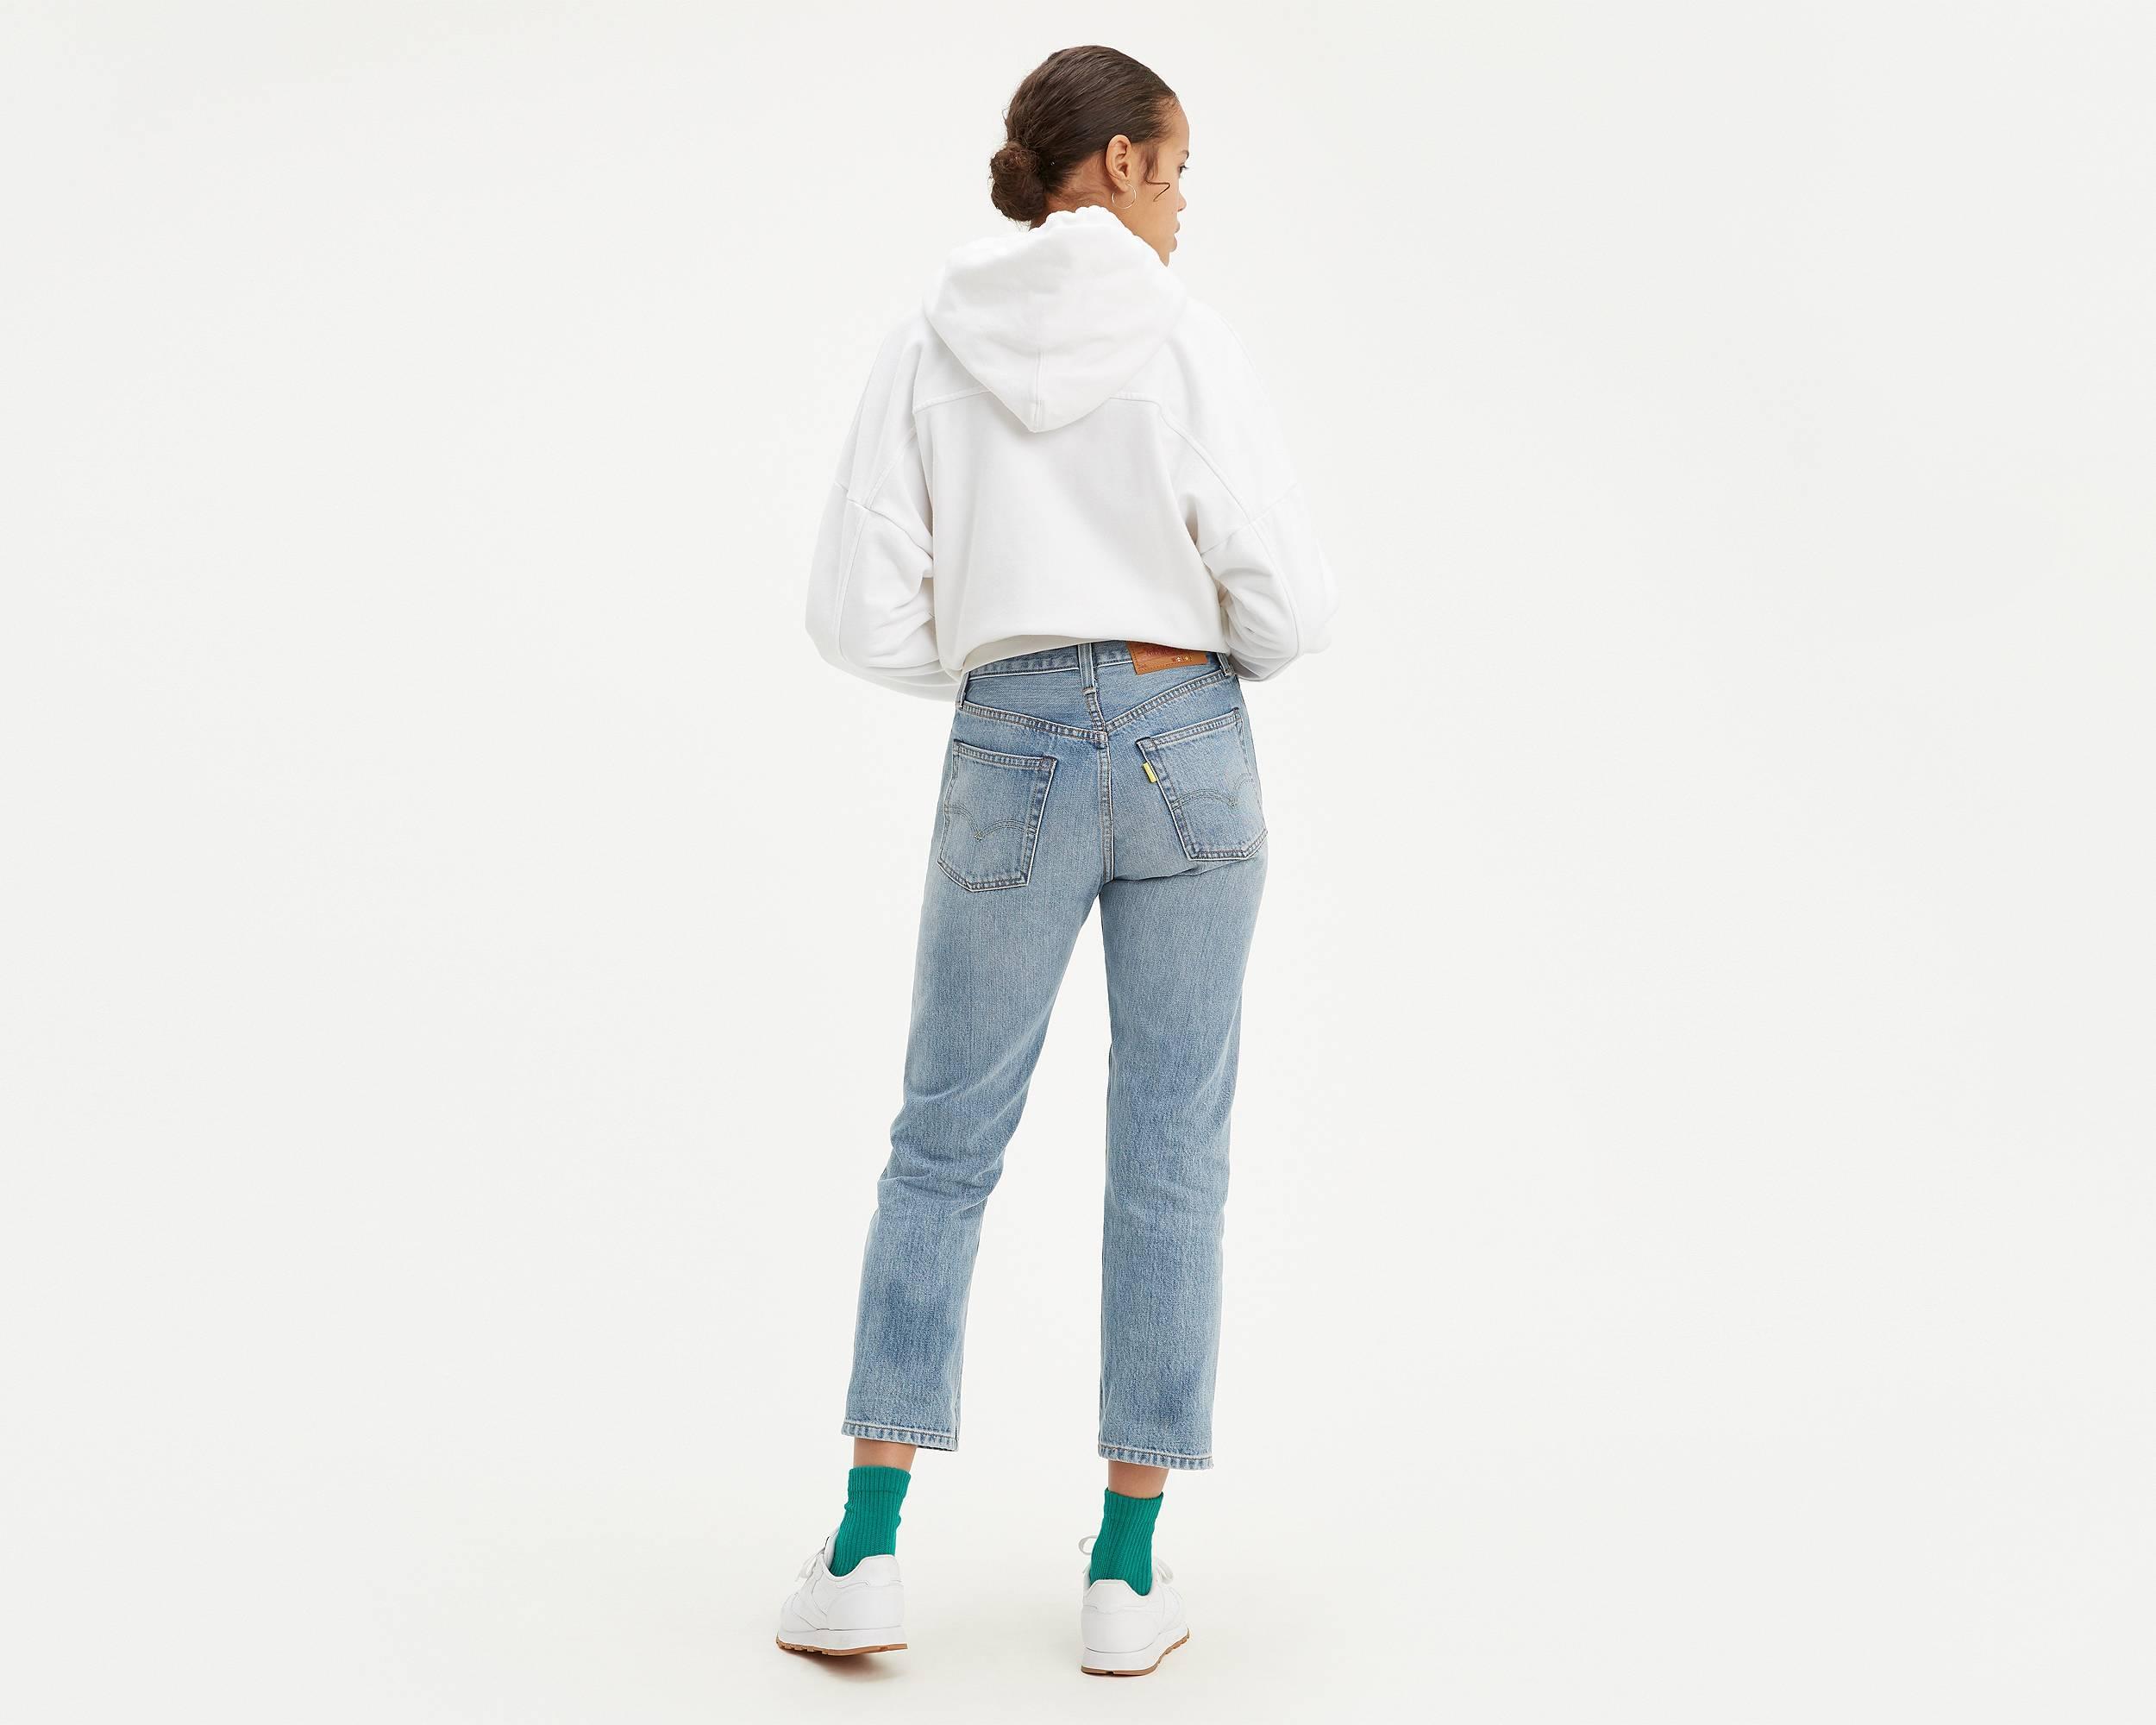 mens selvedge jeans uk